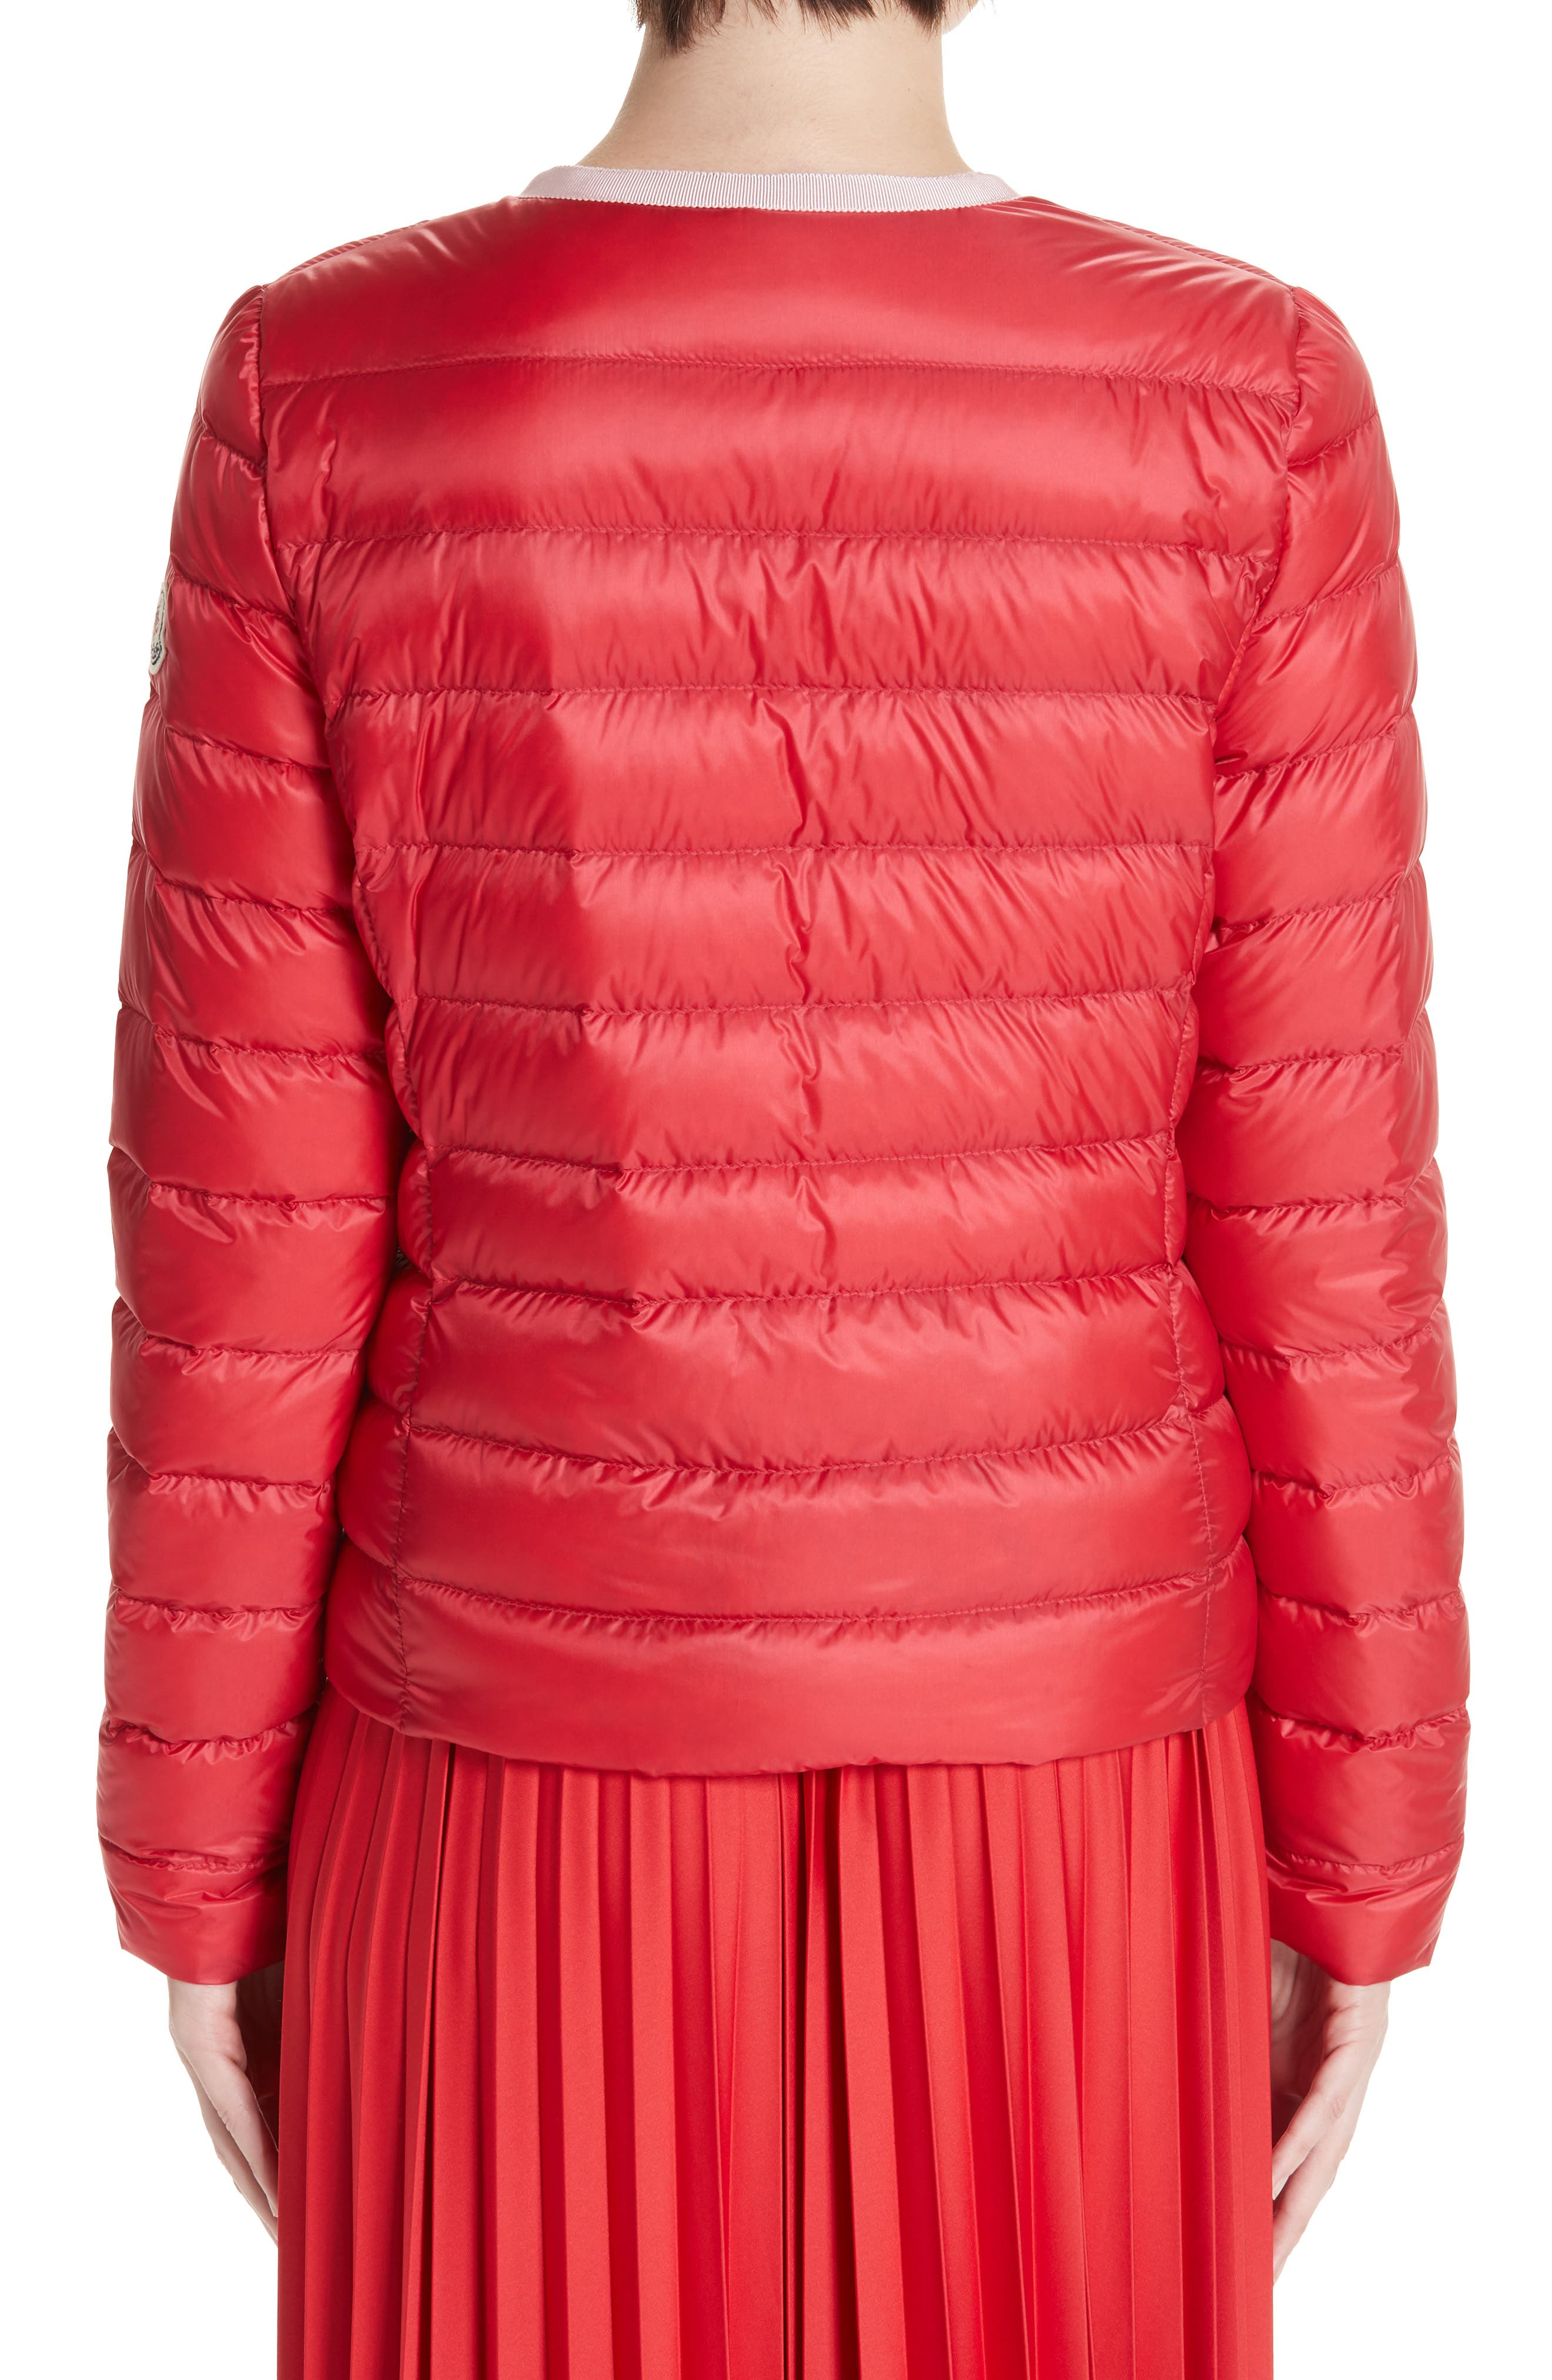 MONCLER, Cristalline Jacket, Alternate thumbnail 2, color, RED